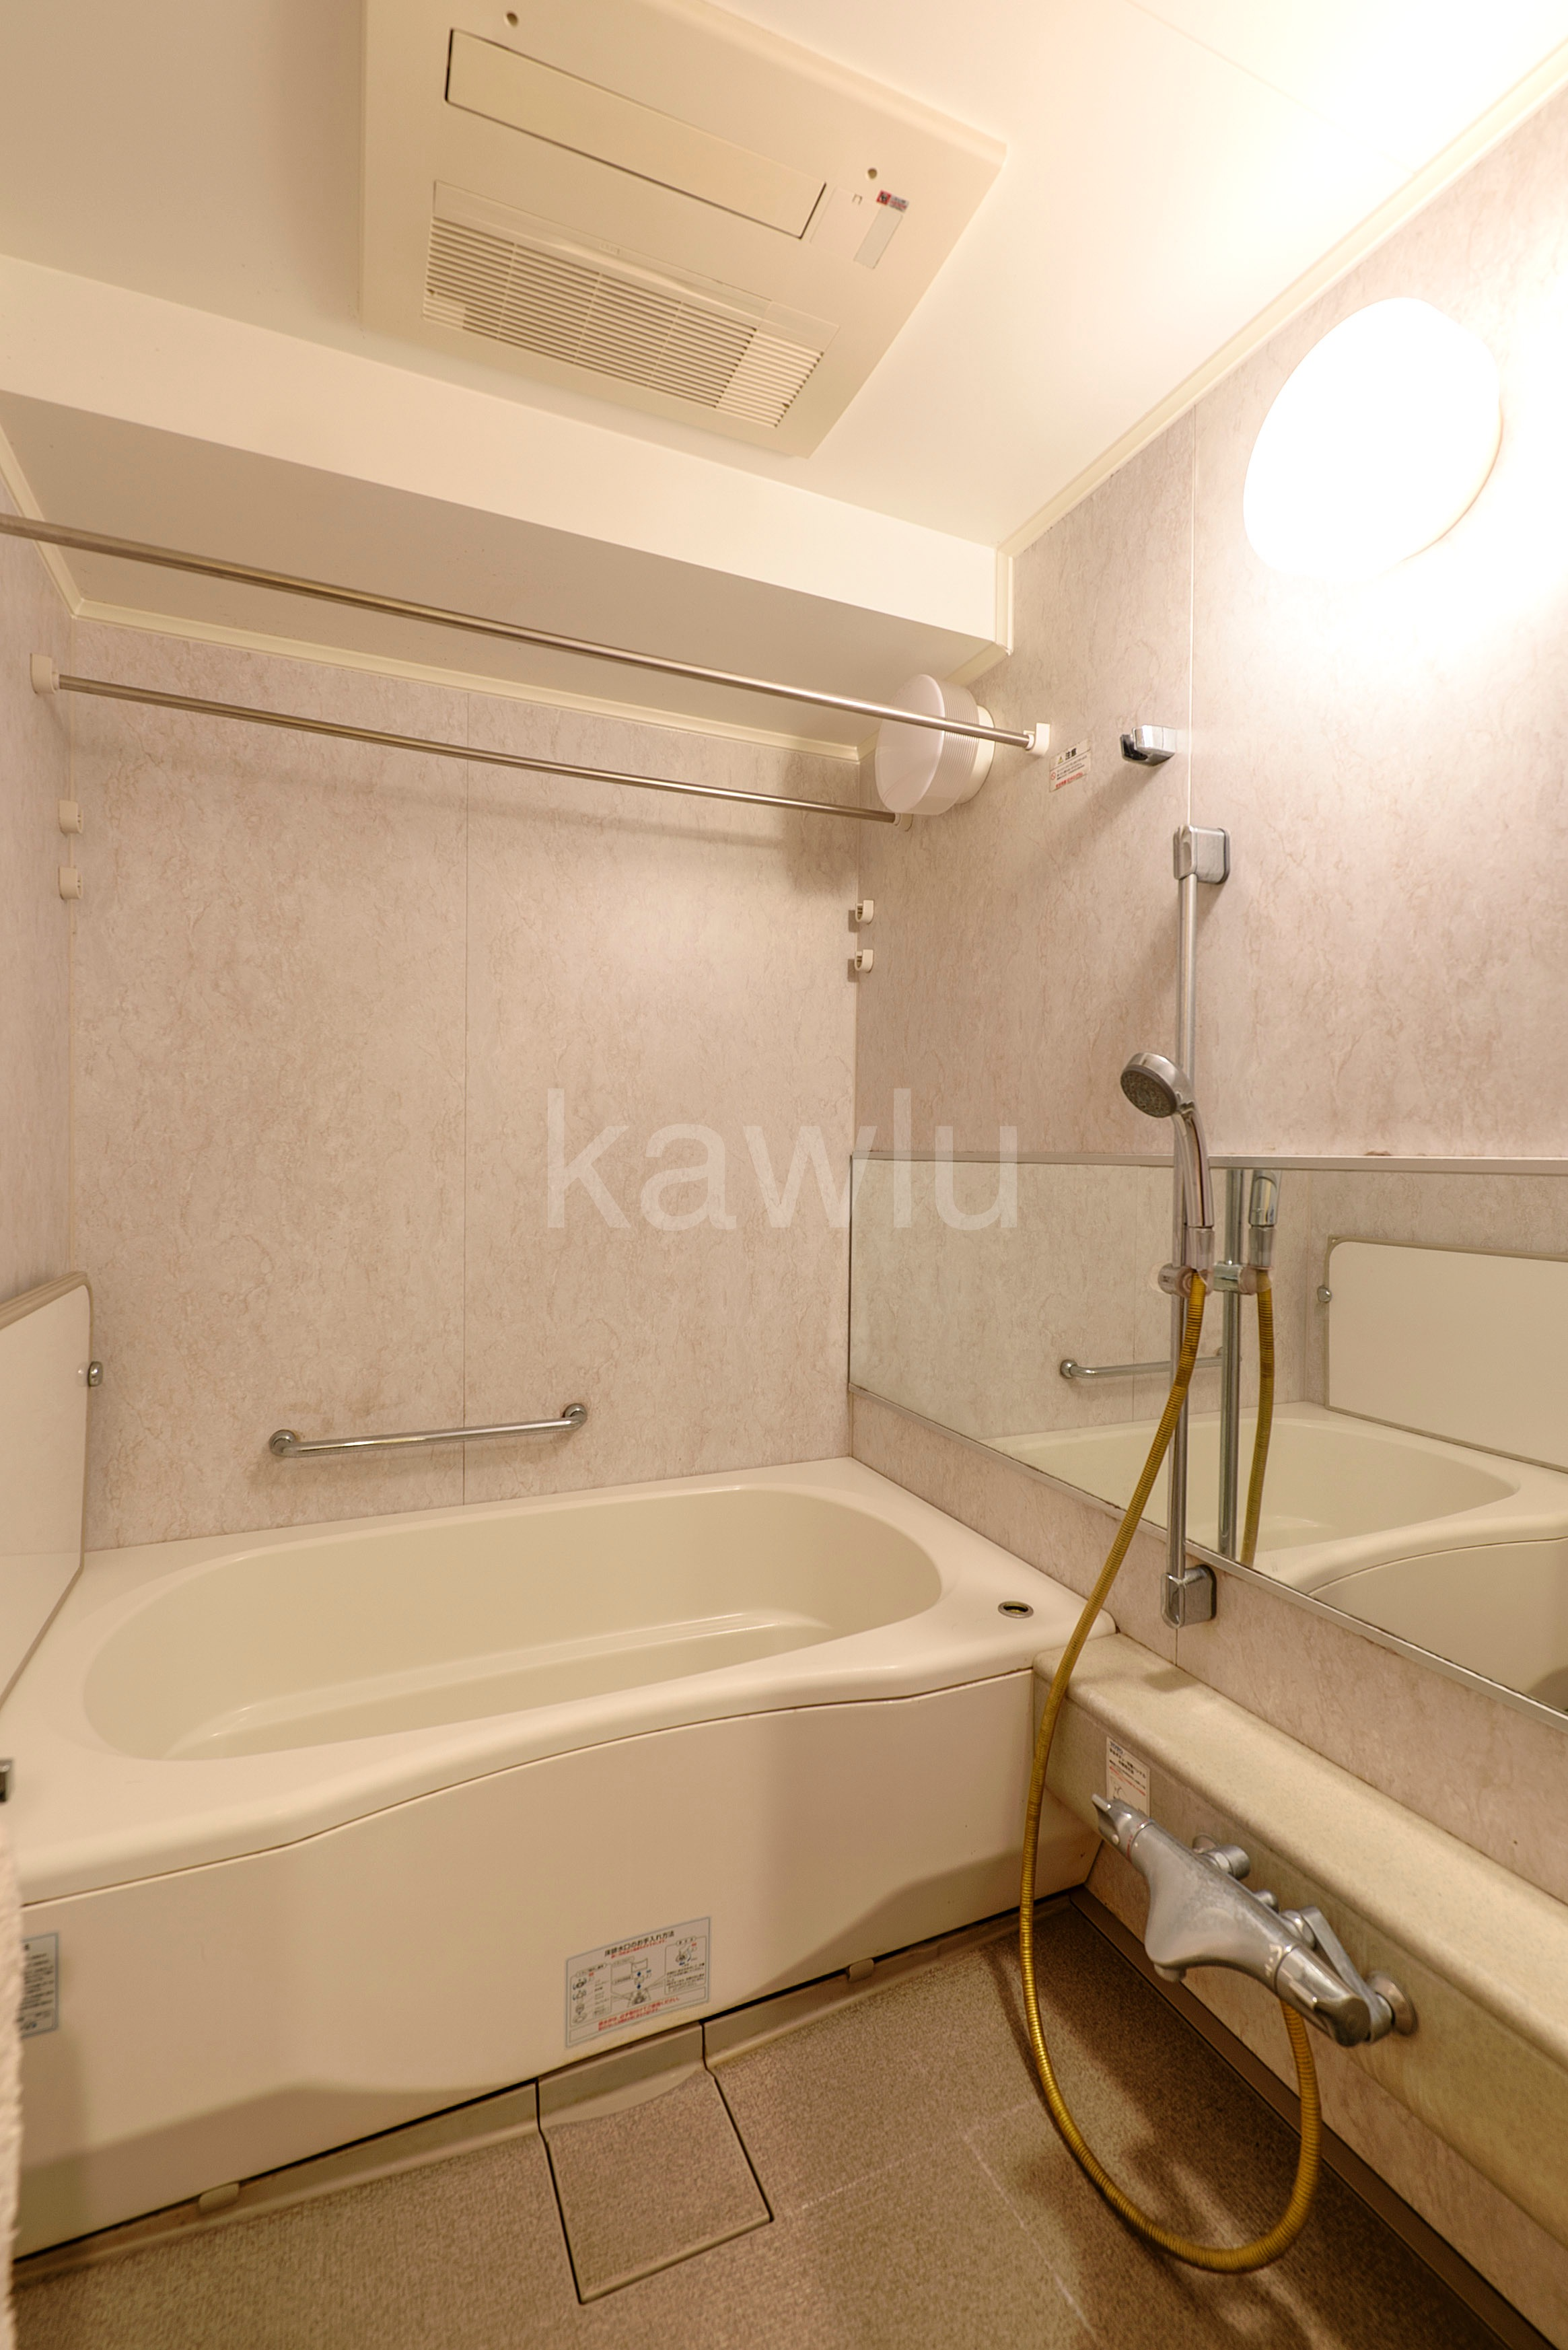 Wコンフォートタワーズ_浴室